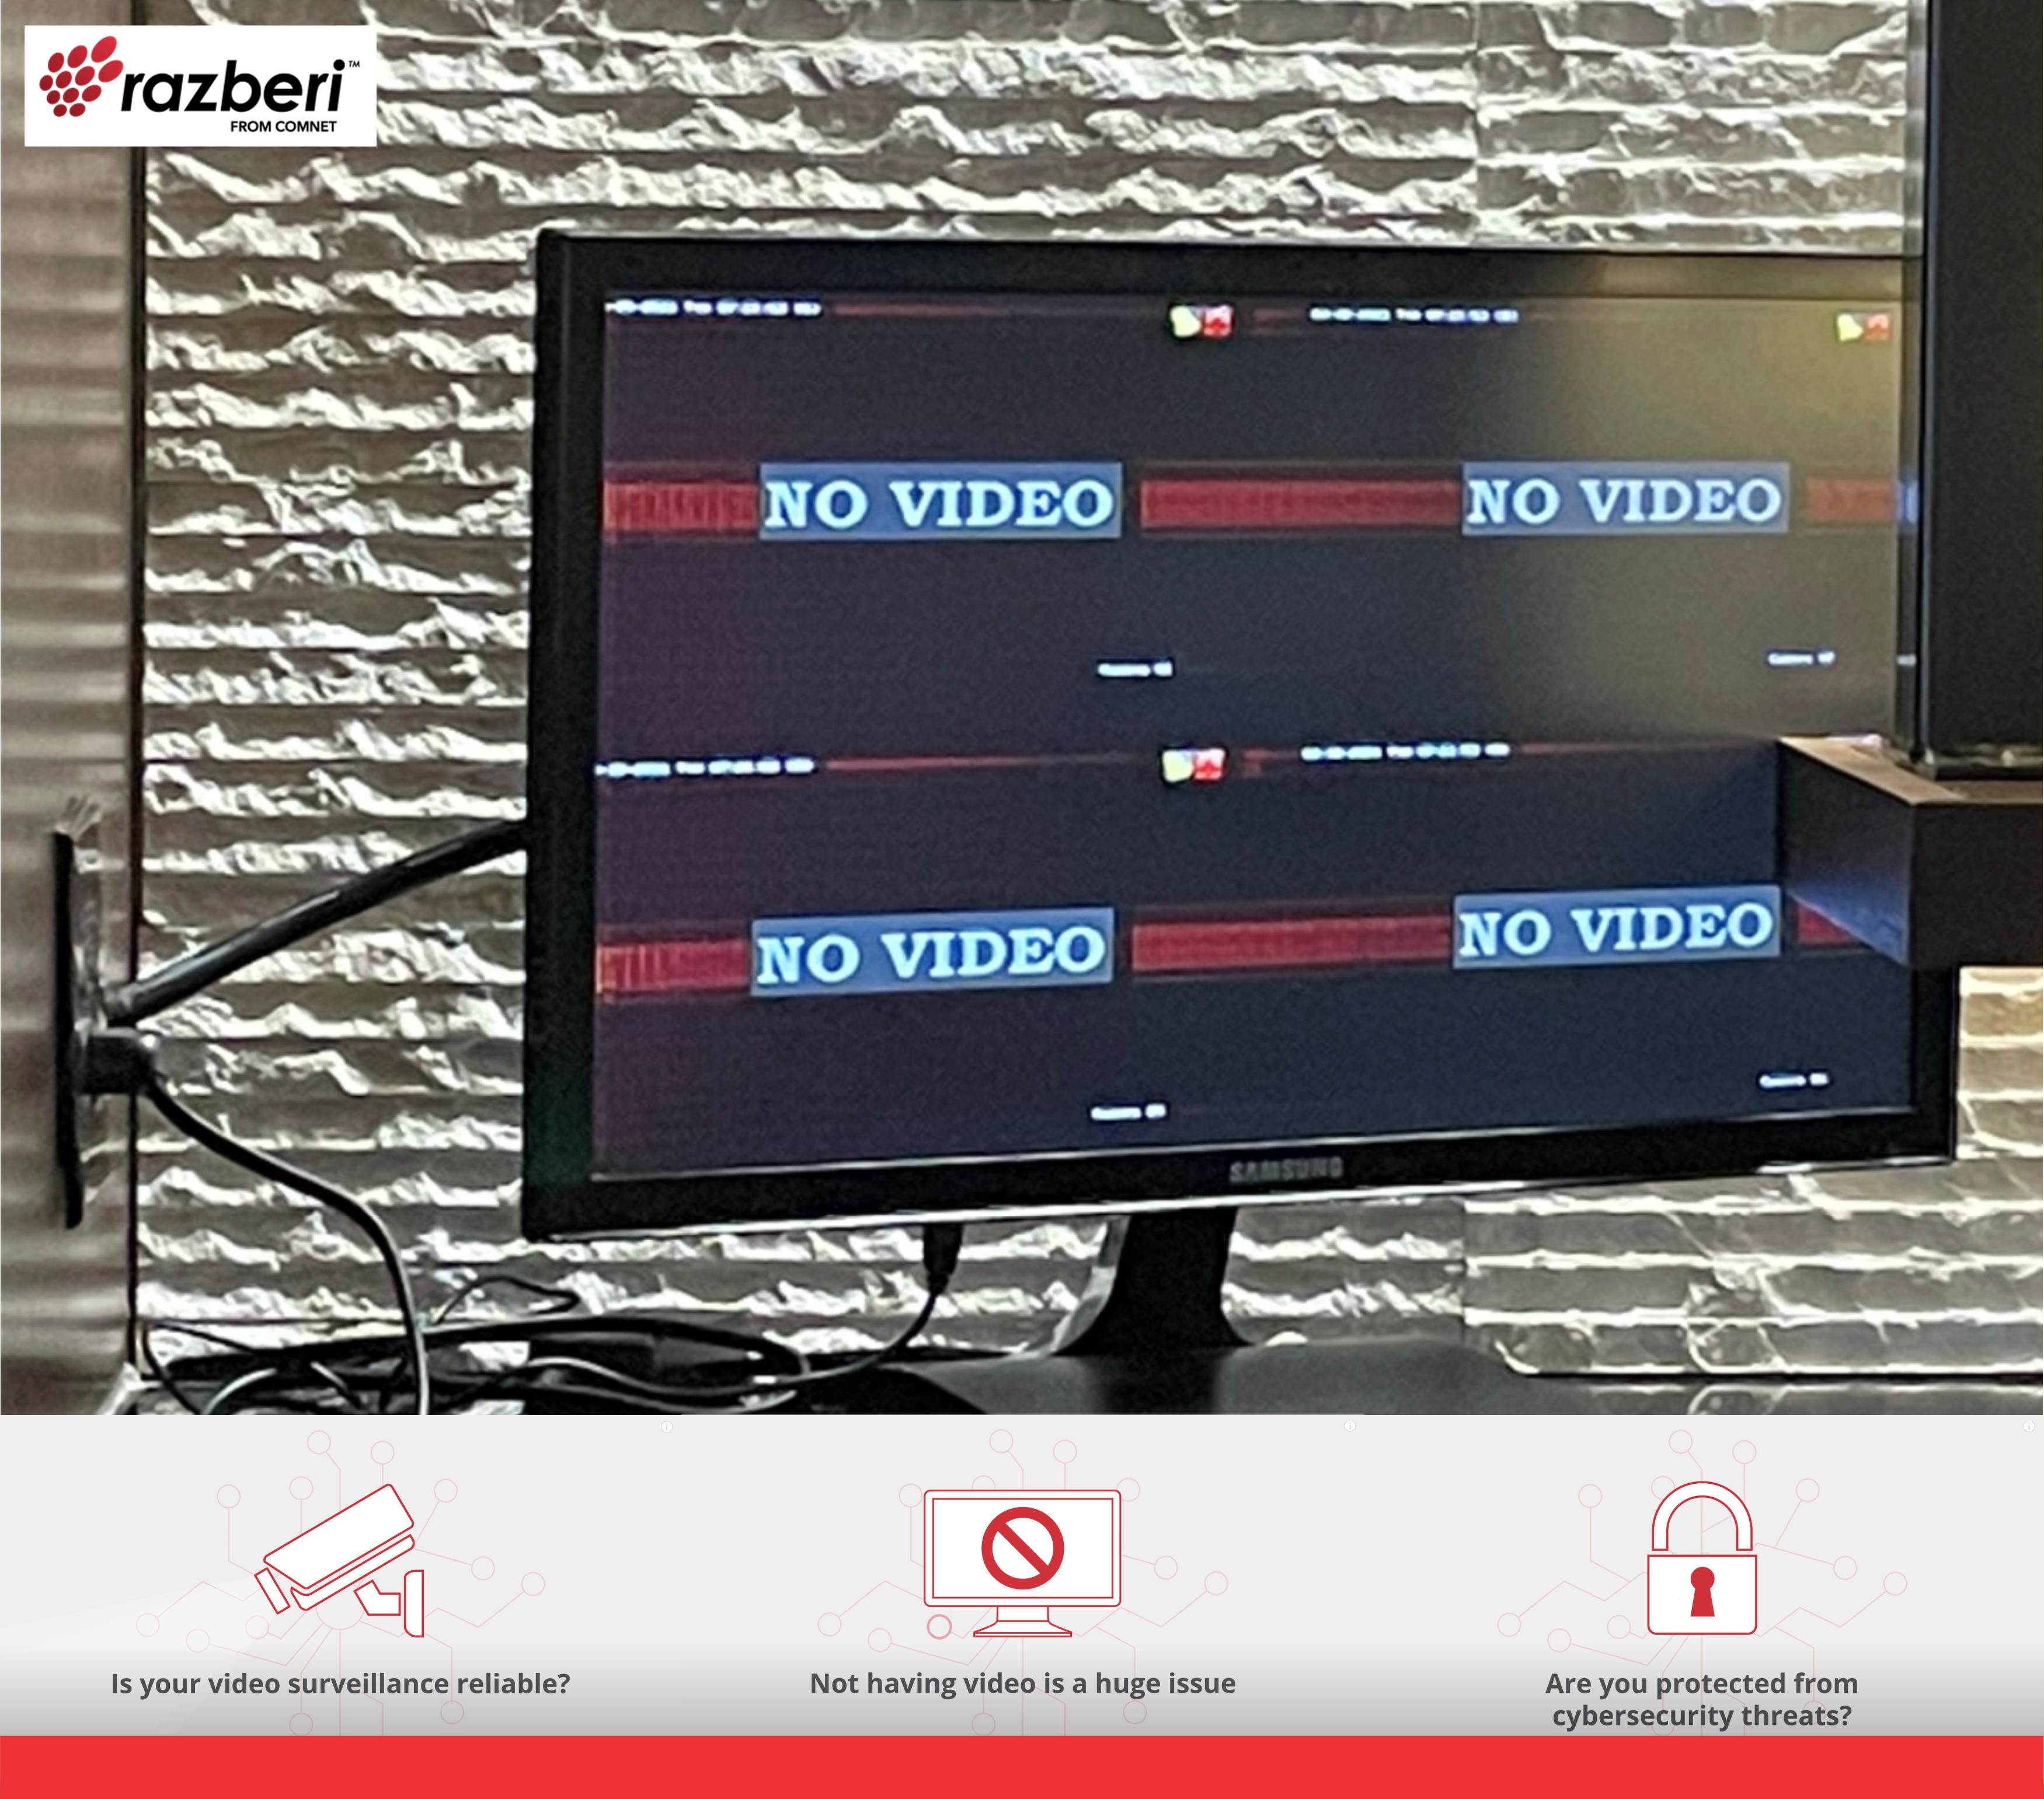 Razberi Video Loss Image